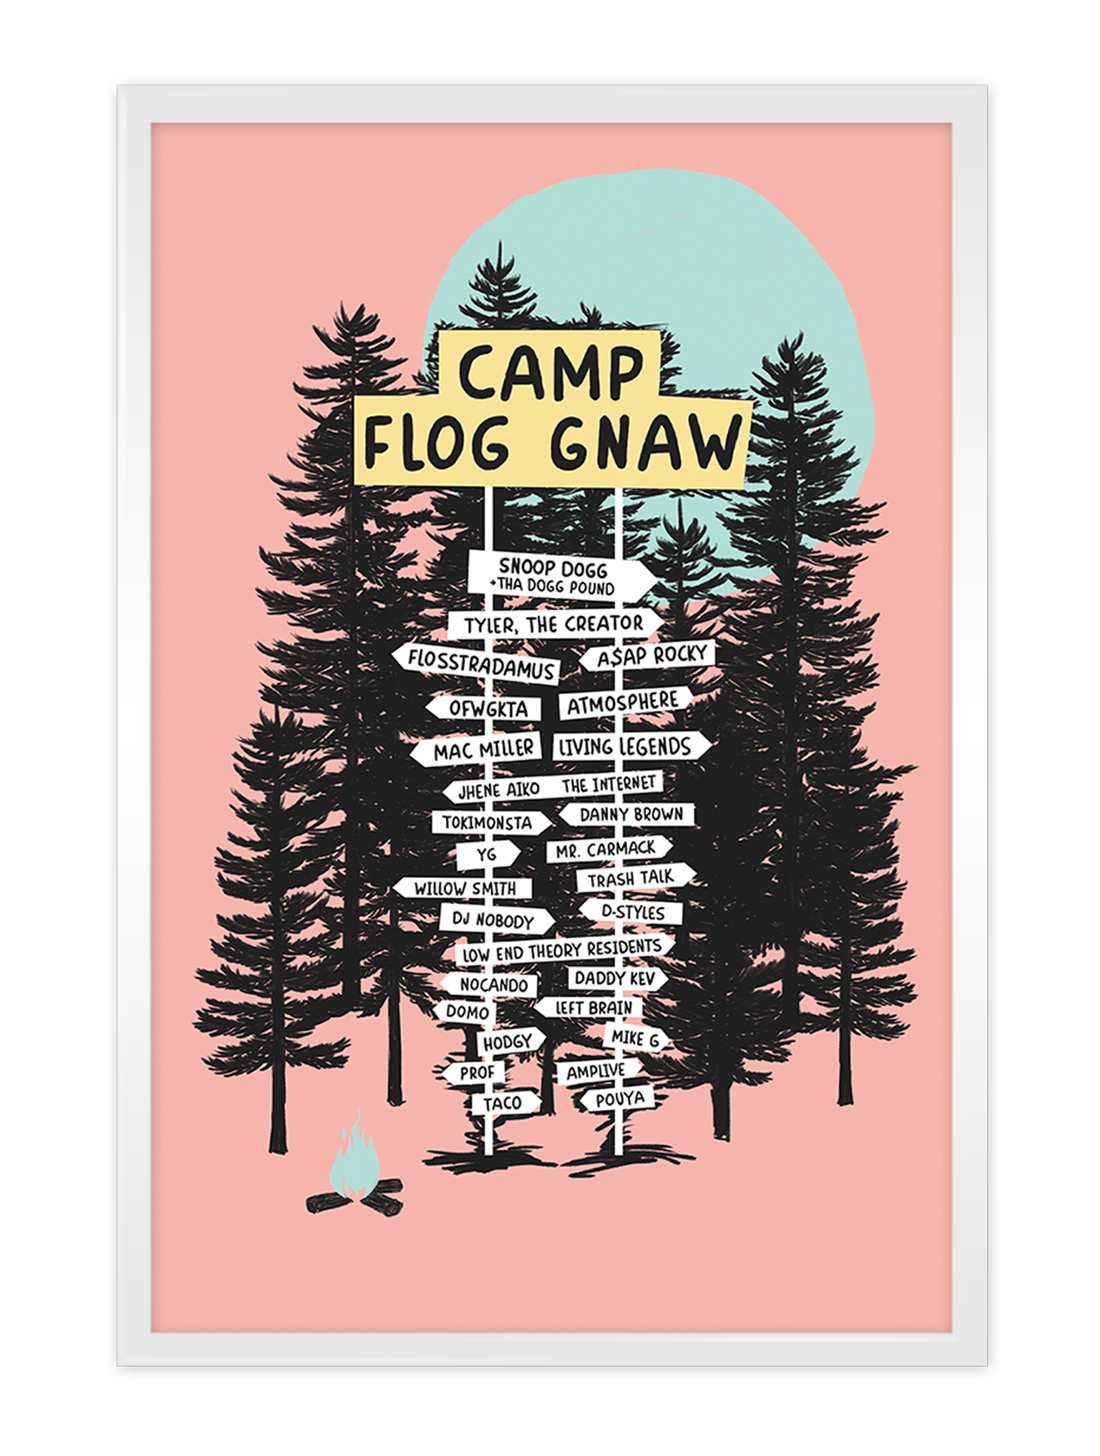 Camp Flog Gnaw - Screenprint Music Festival Poster, 2015